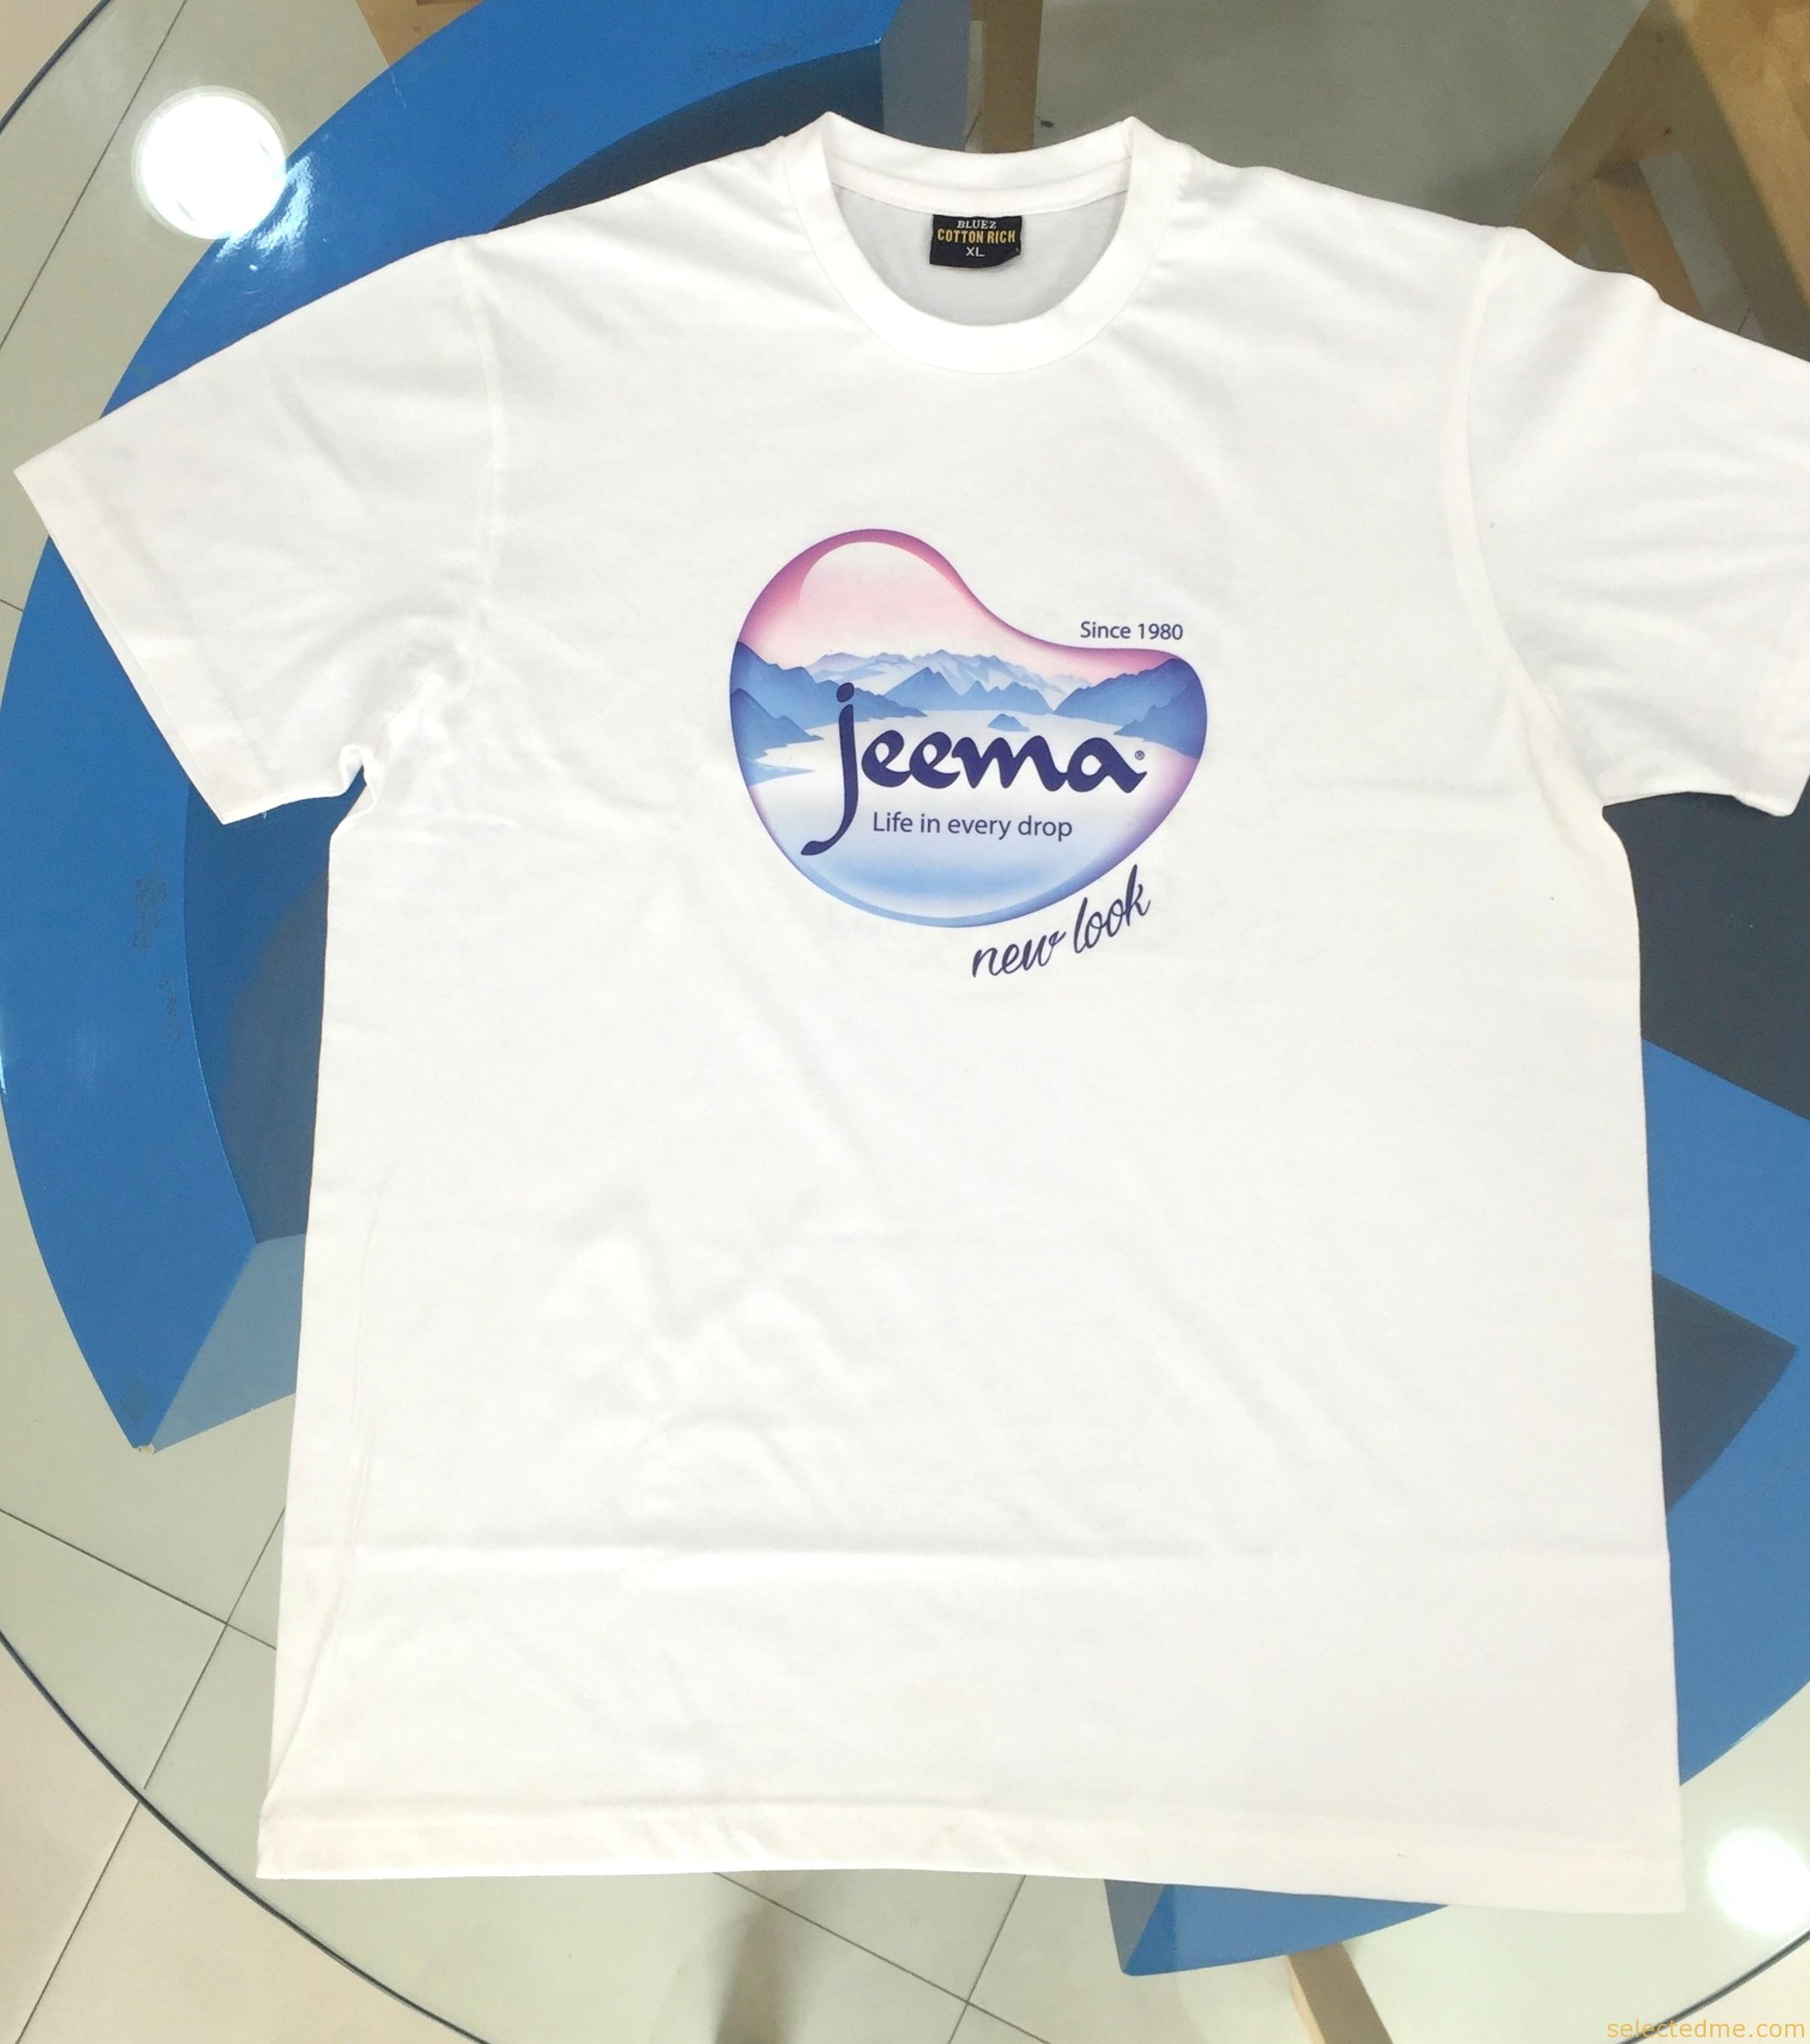 bbf969cae T Shirts Printing Dubai, Make impressive print on Tees